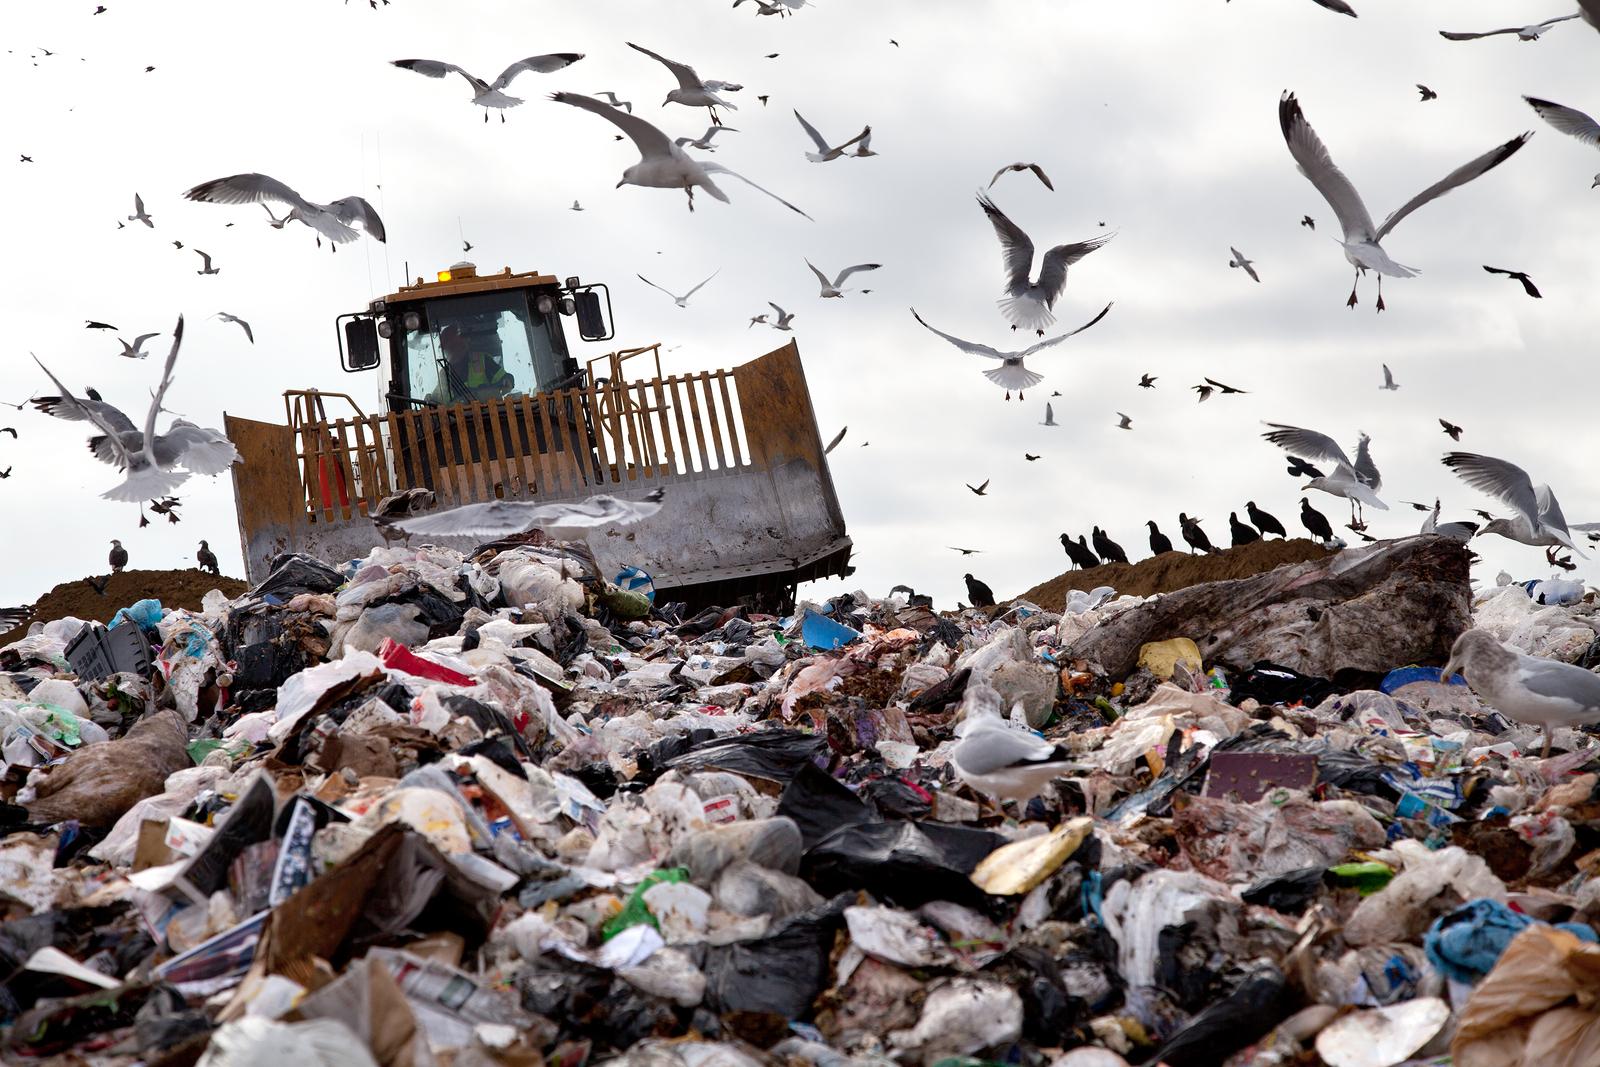 bigstock-Landfill-With-Birds-57624611.jpg